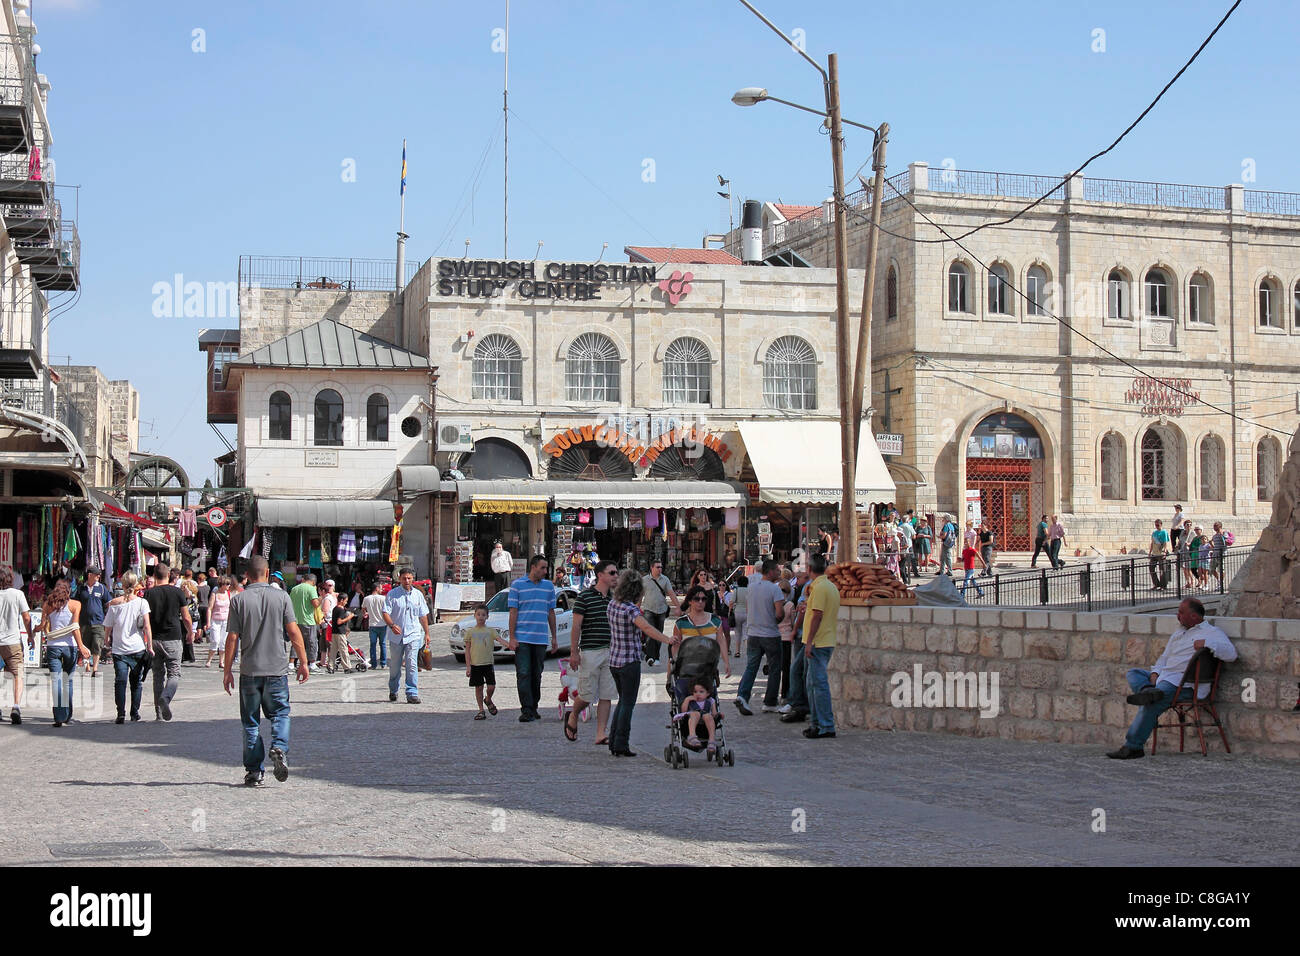 The Swedish Christian Study Centre and the Christian Information Centre just inside Jaffa Gate, Jerusalem - Stock Image